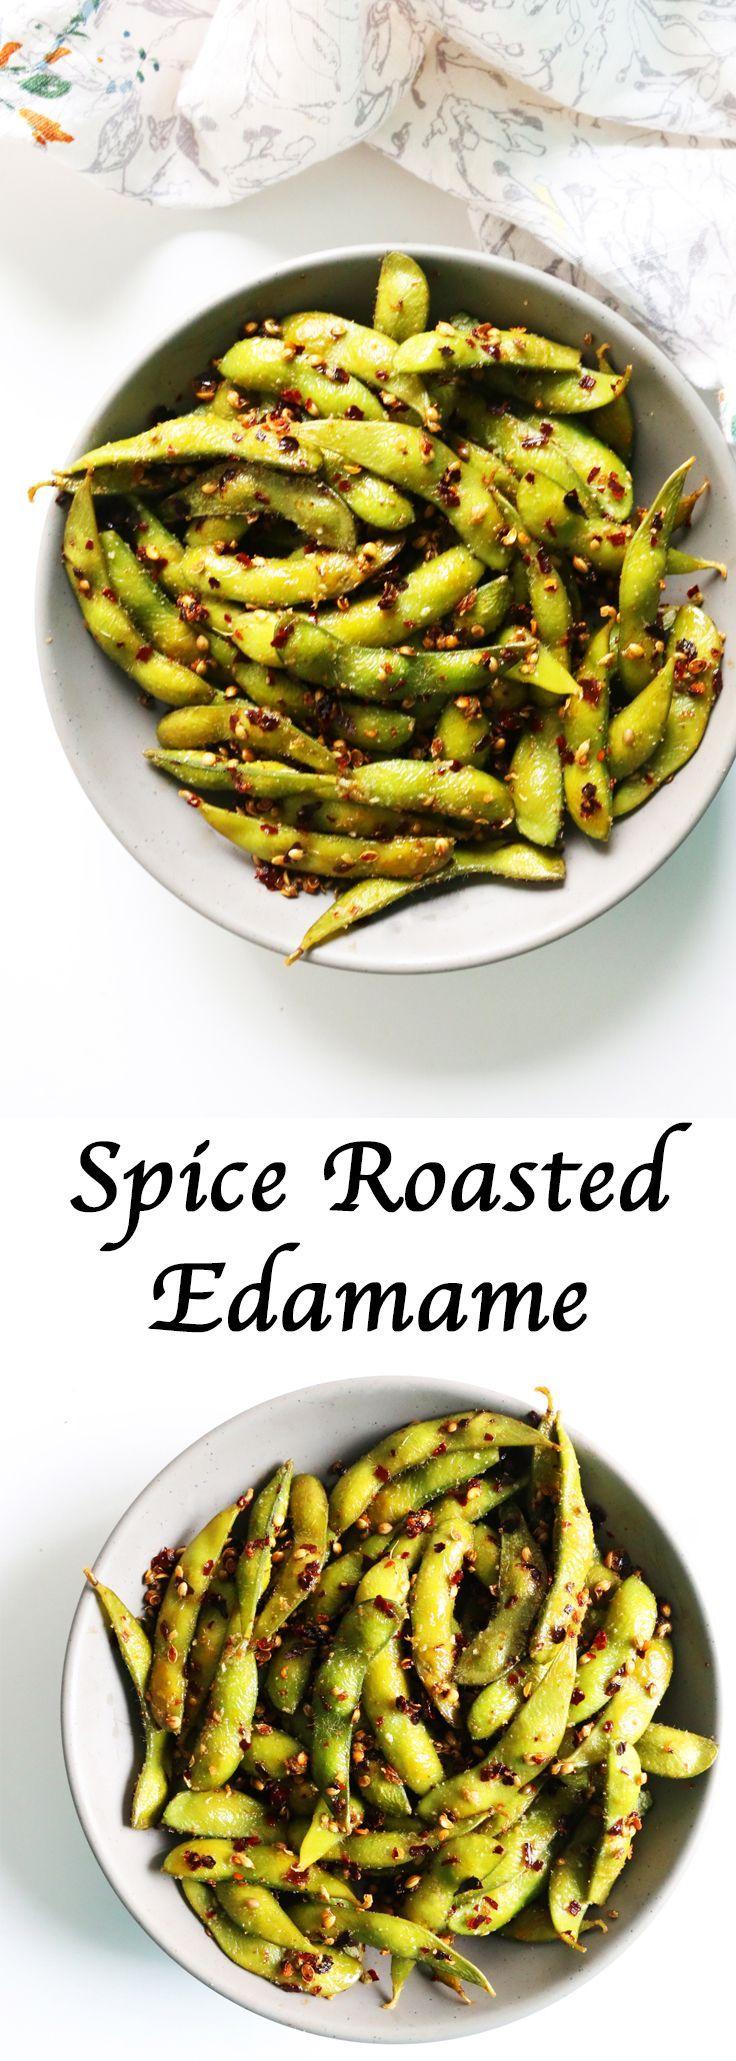 SpiceRoasted Edamame Roasted edamame, Indian food